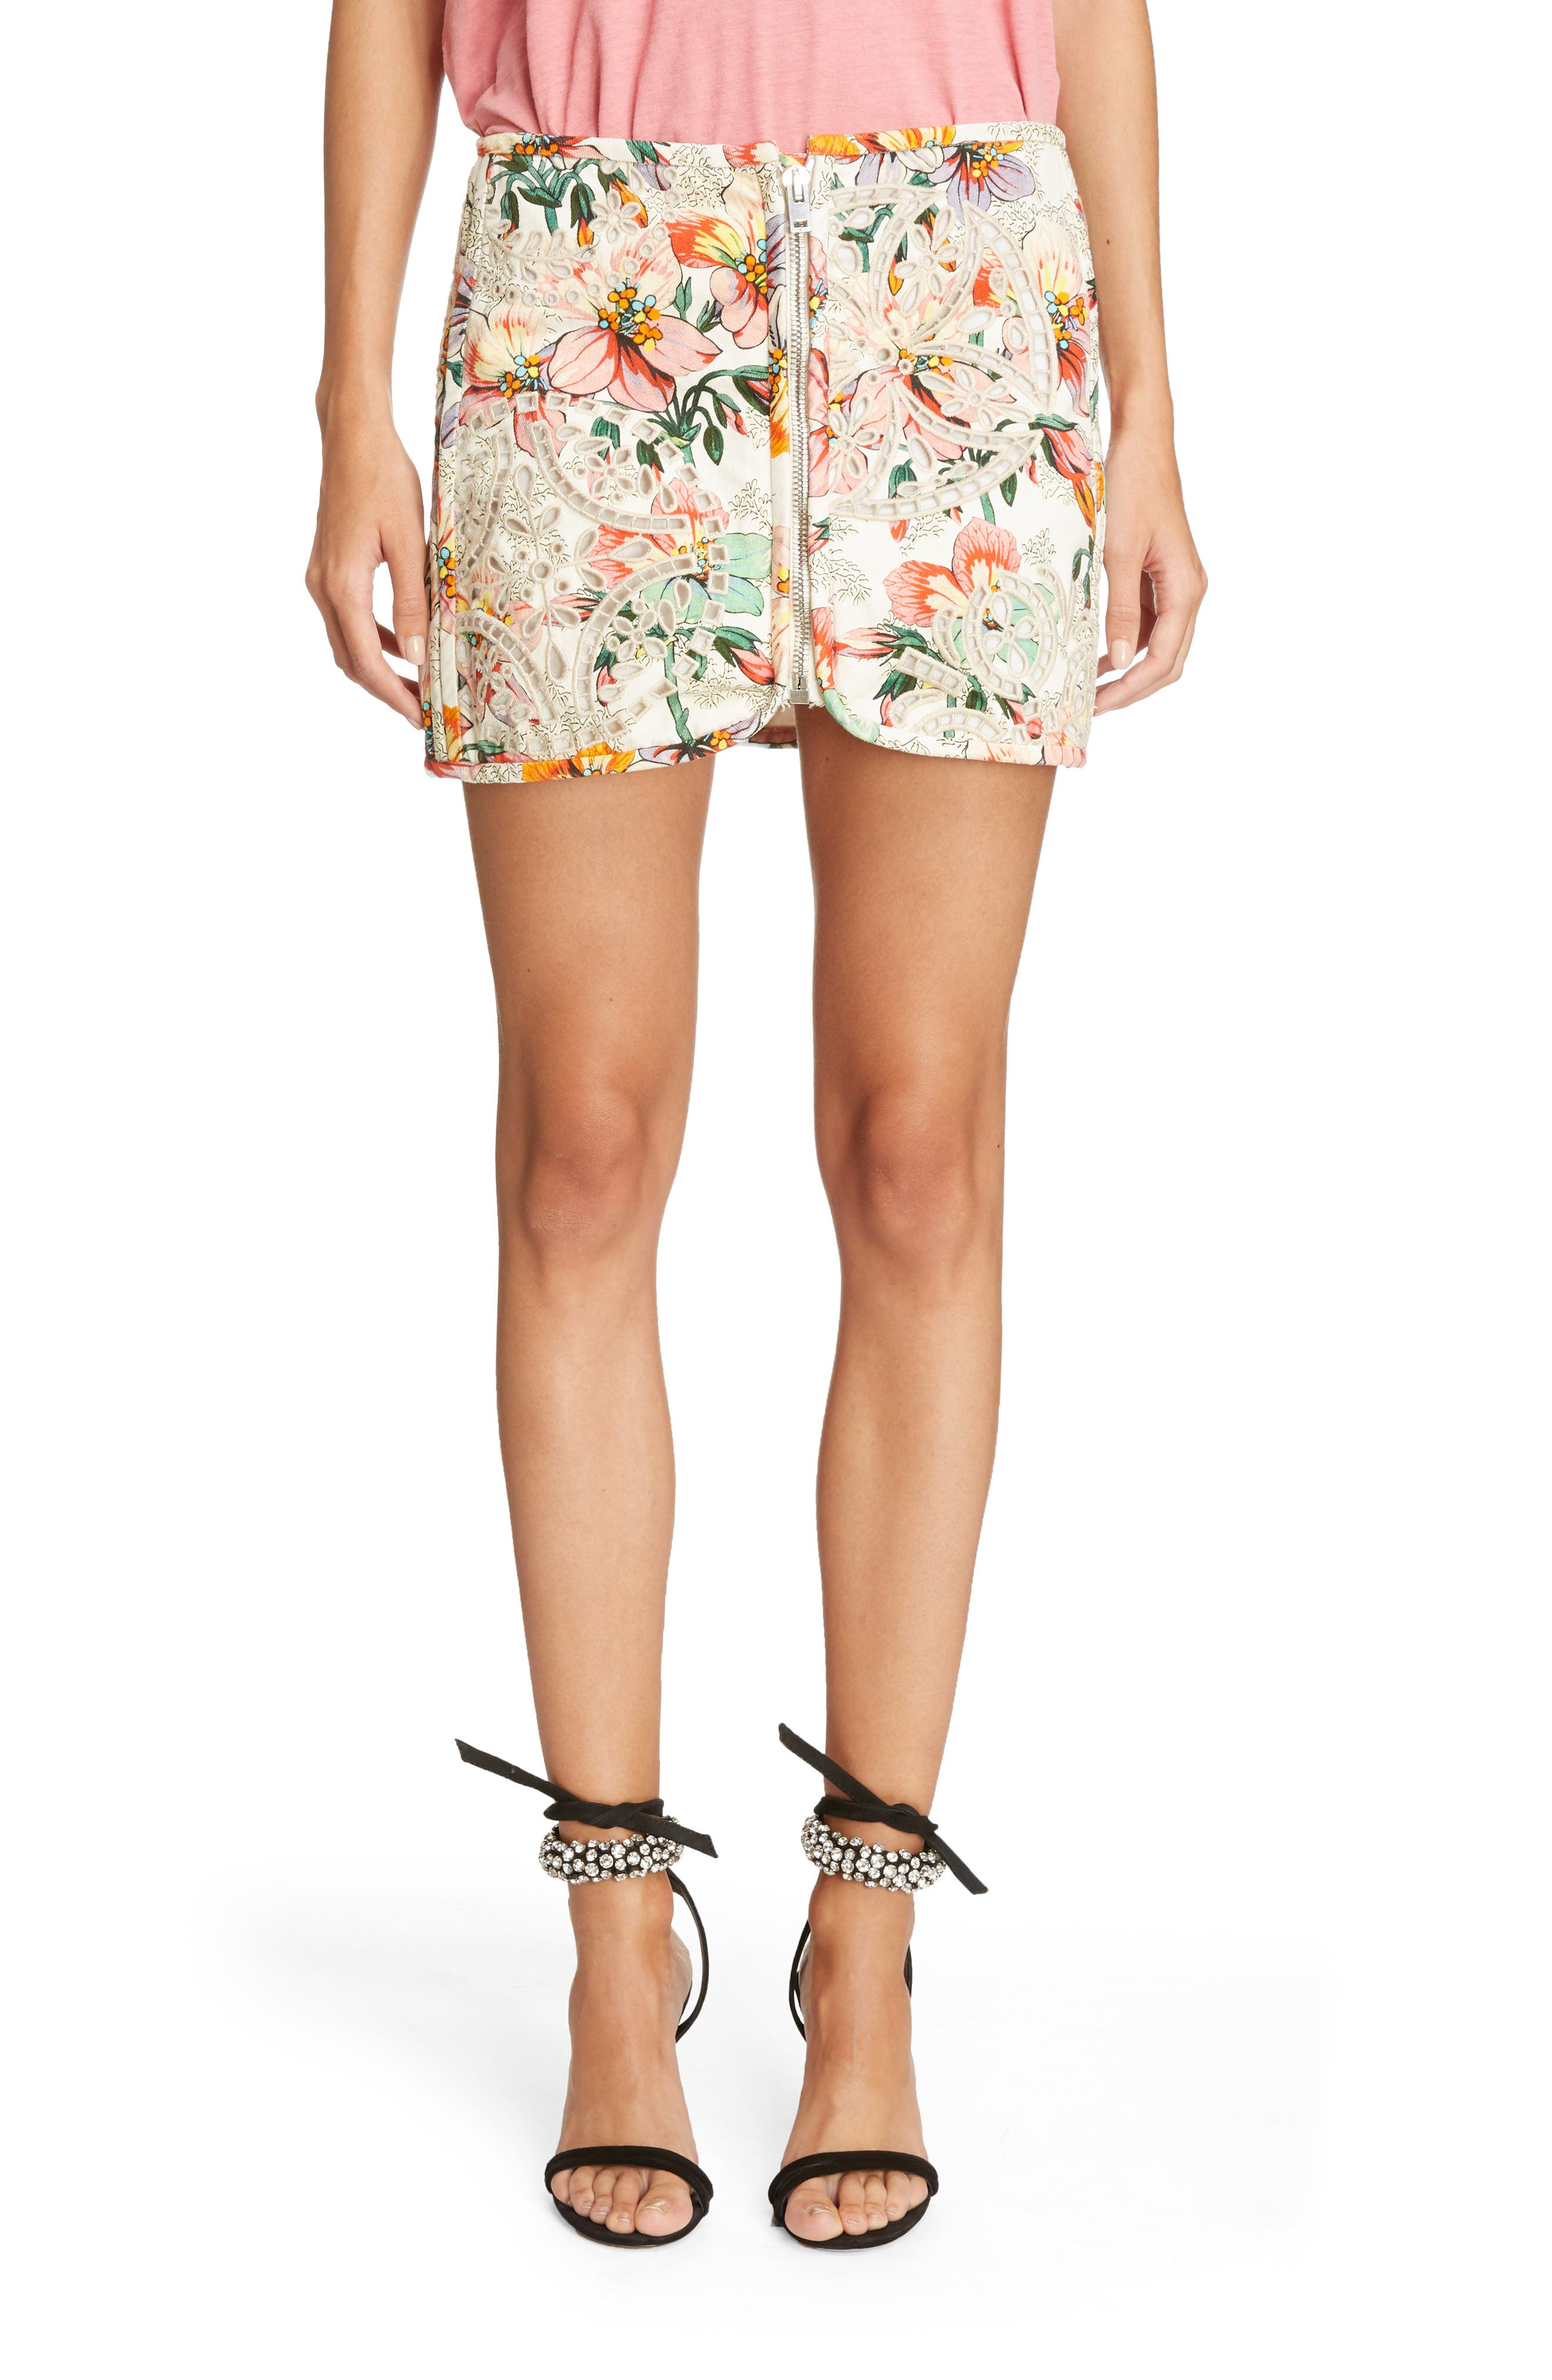 Isabel Marant Hawaiian Print Miniskirt